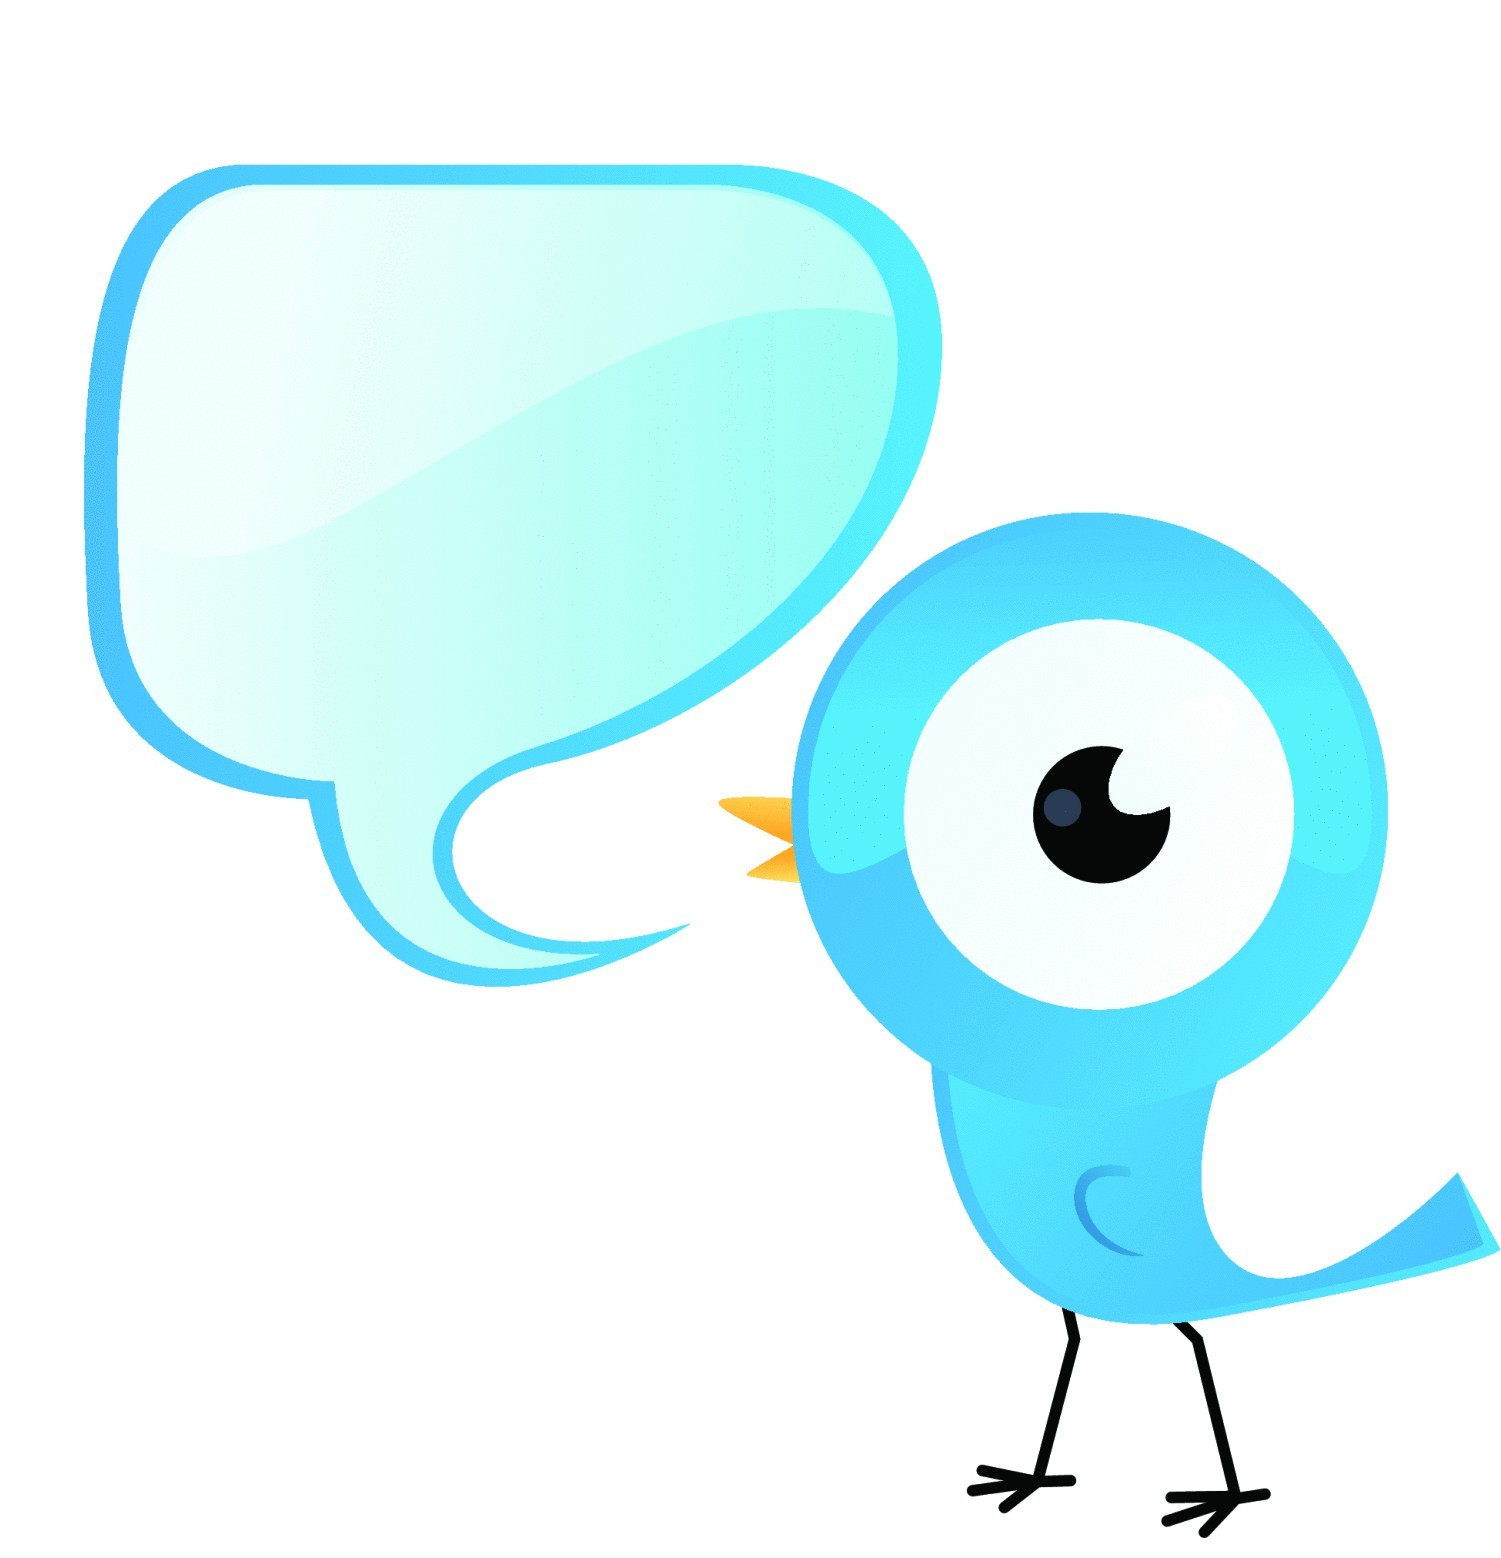 tweeter.